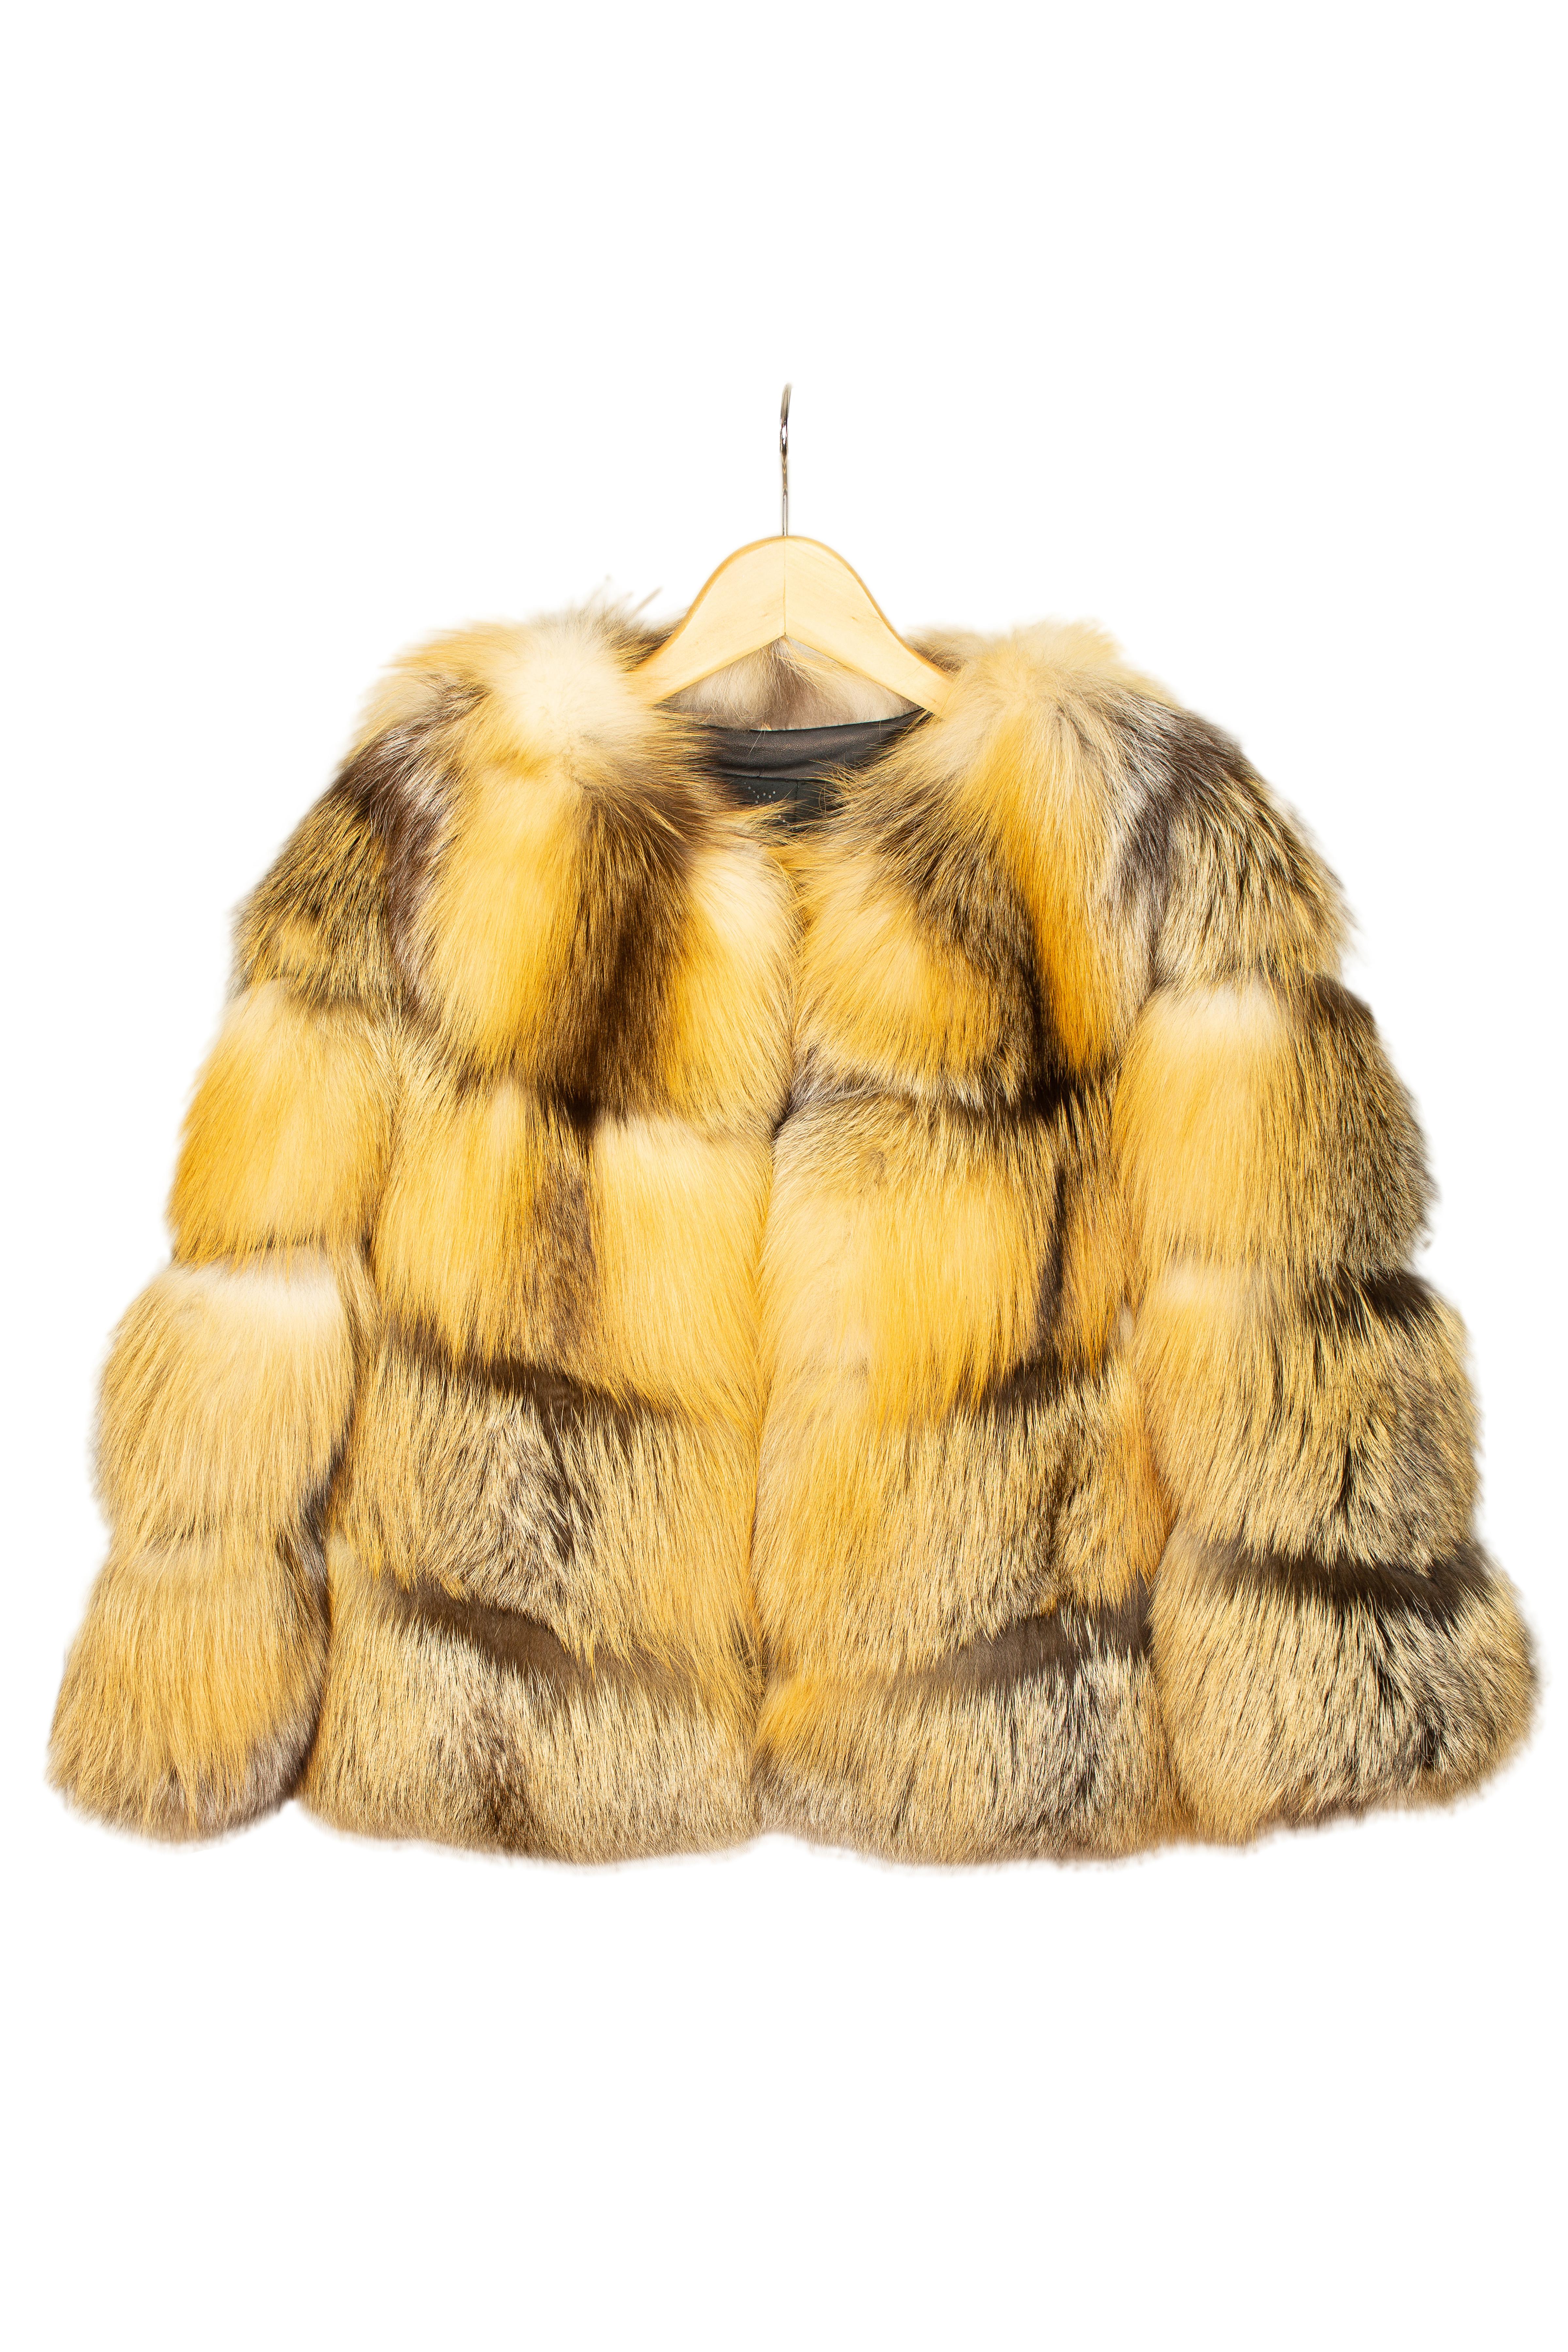 DV Luxury Goods Mustard Fur Coat